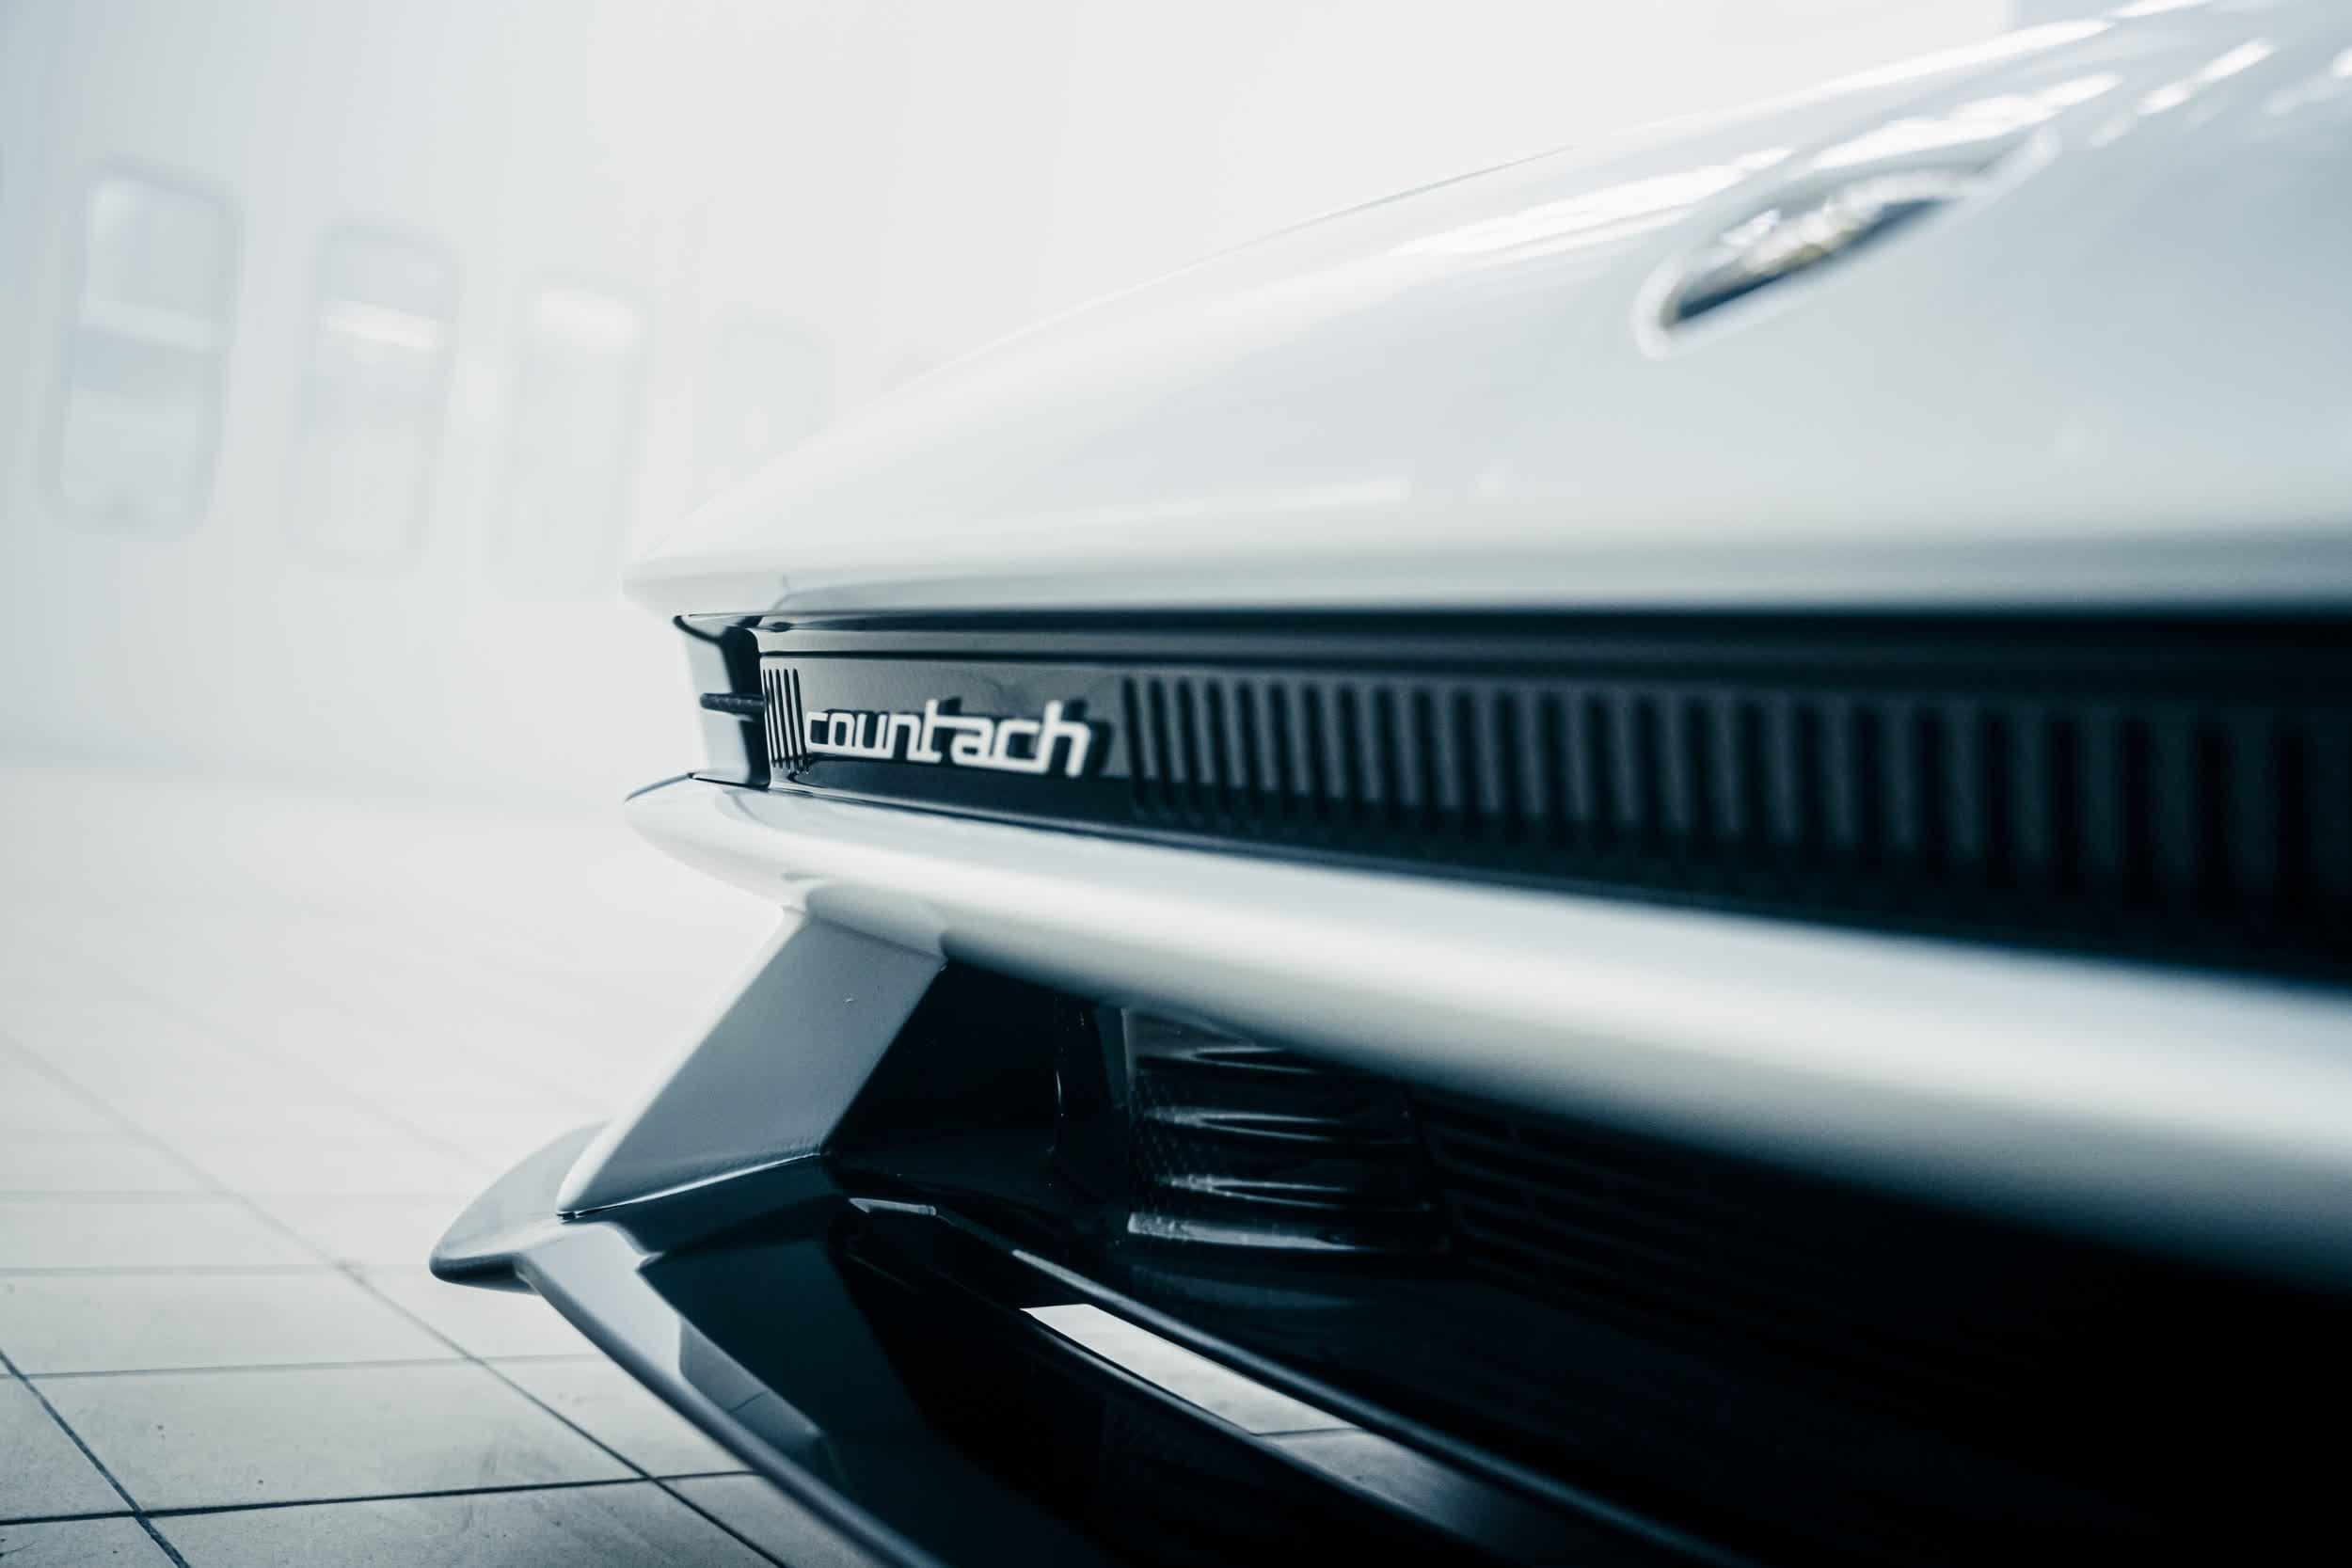 Lamborghini ramene la Countach en tant quhybride en edition limitee